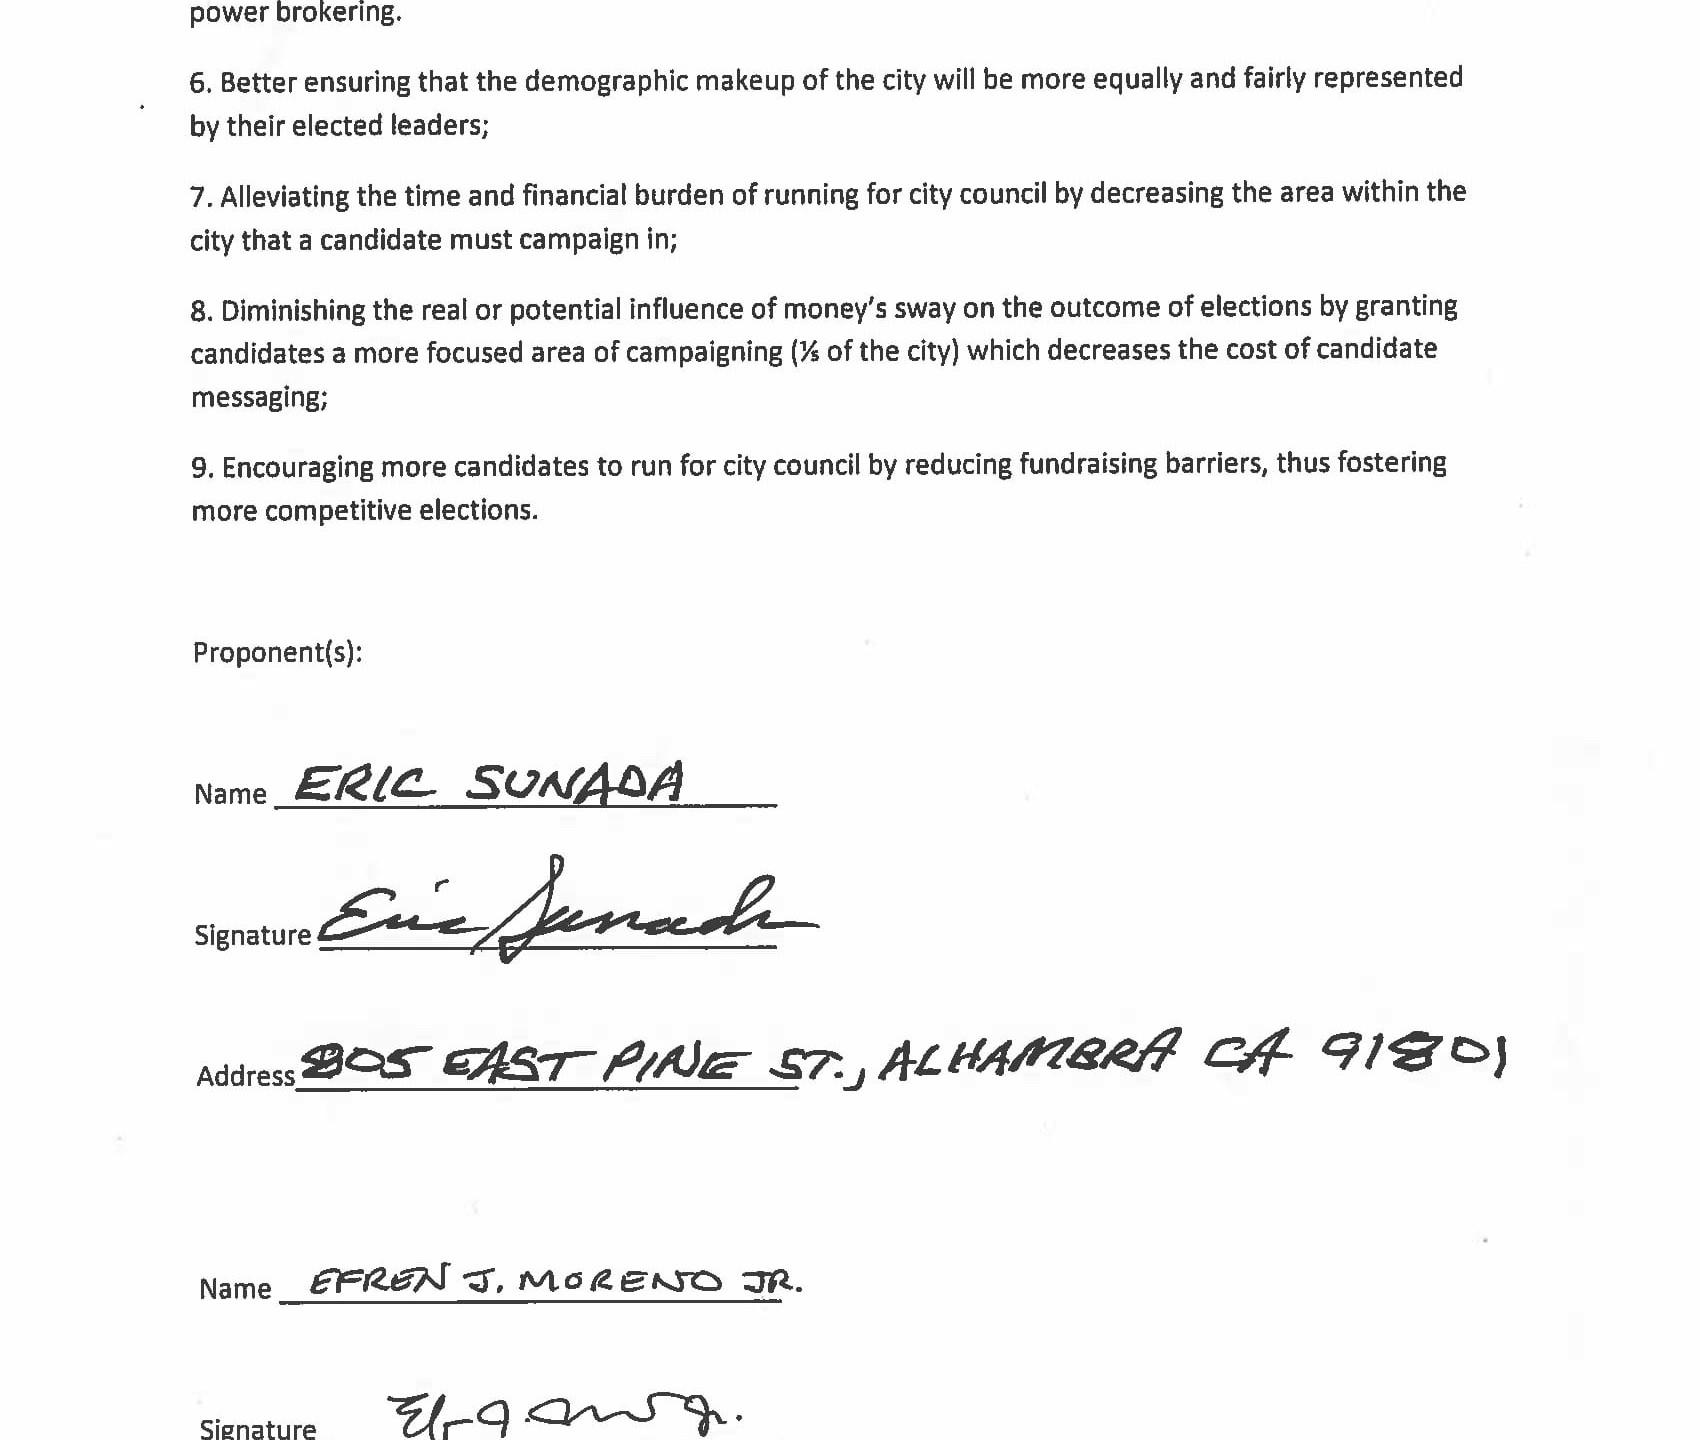 Initiative paperwork stamped by city clerk-04